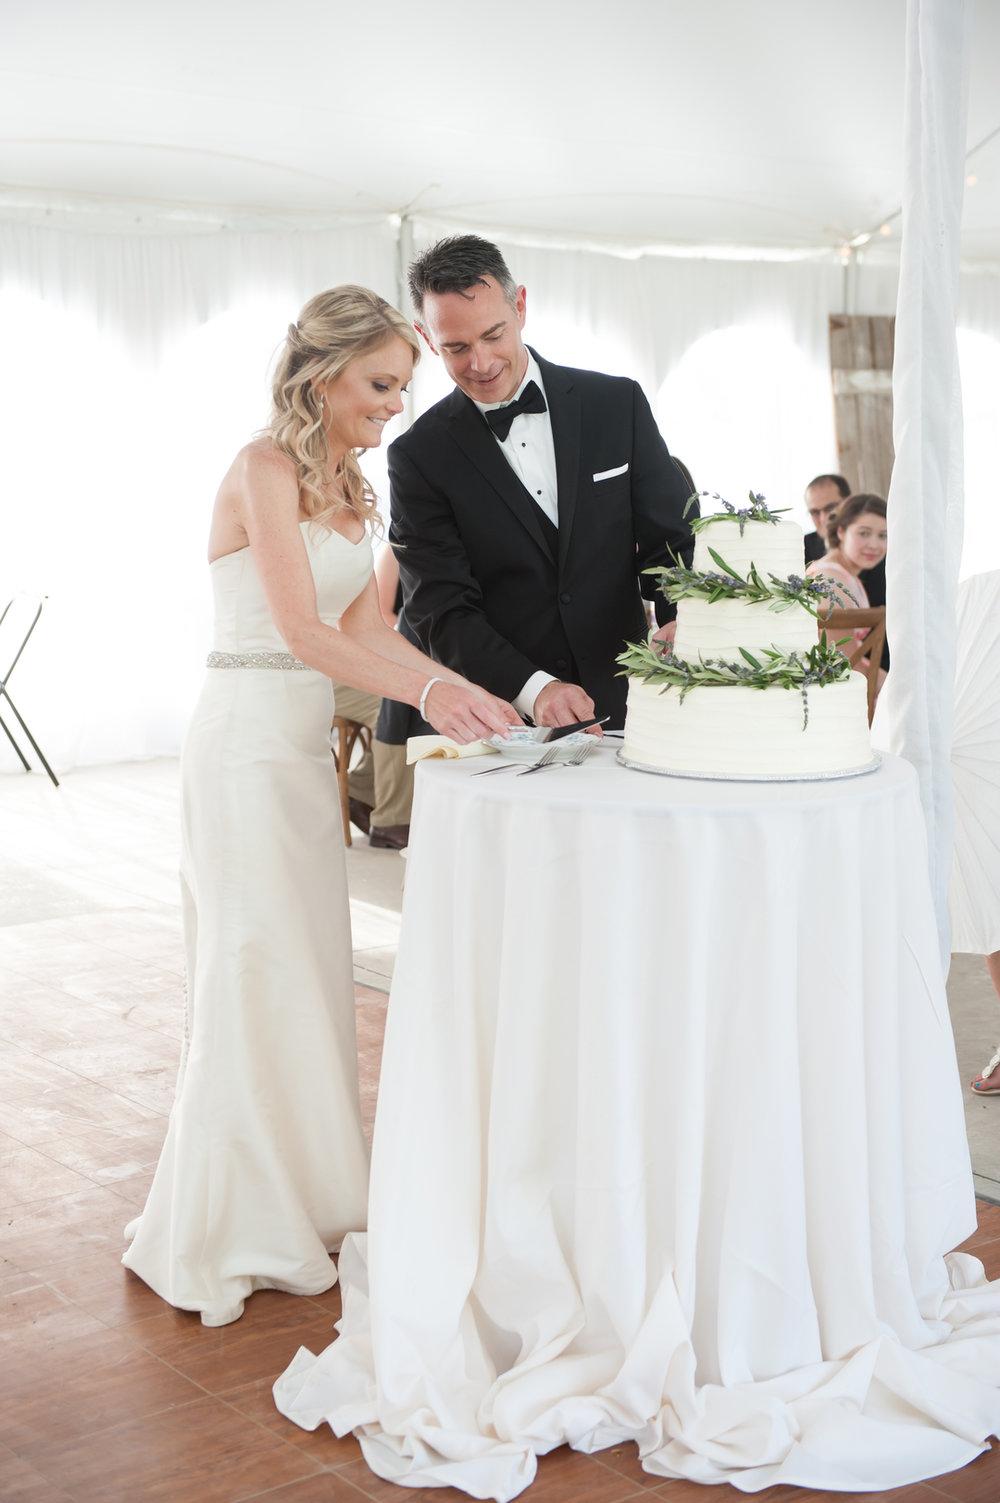 Bride and Groom Cutting the Cake Lavender Cake Chicago Farm Wedding Elite Photo